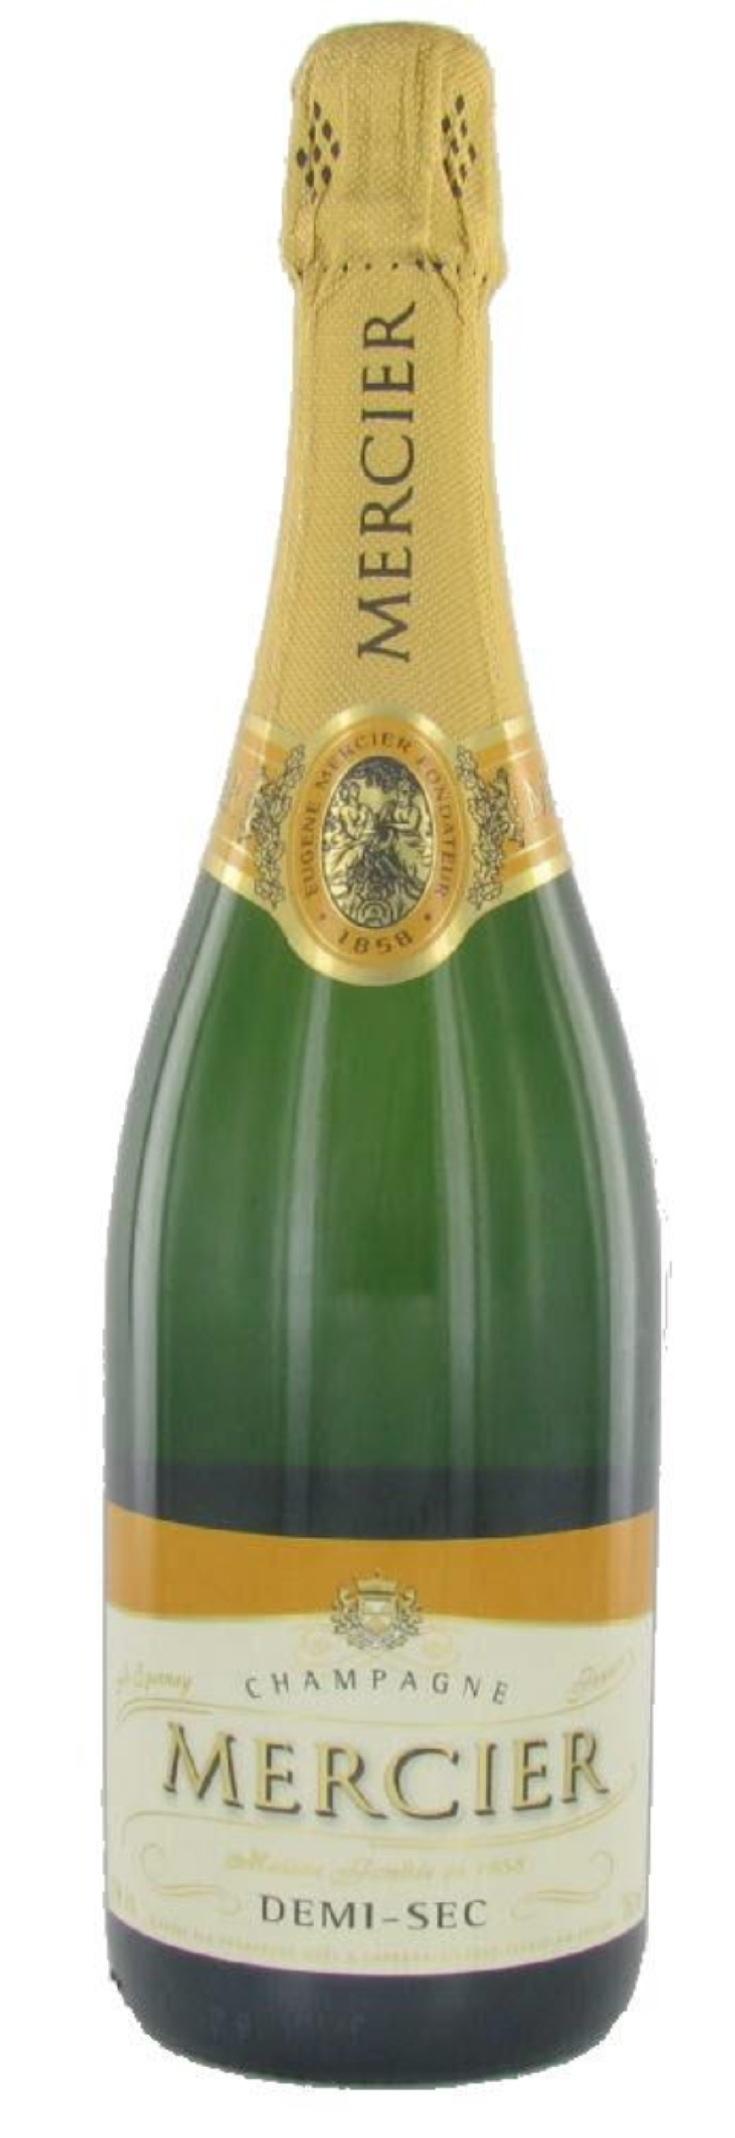 Buy Demi sec champagne.. demi-sec means sweet